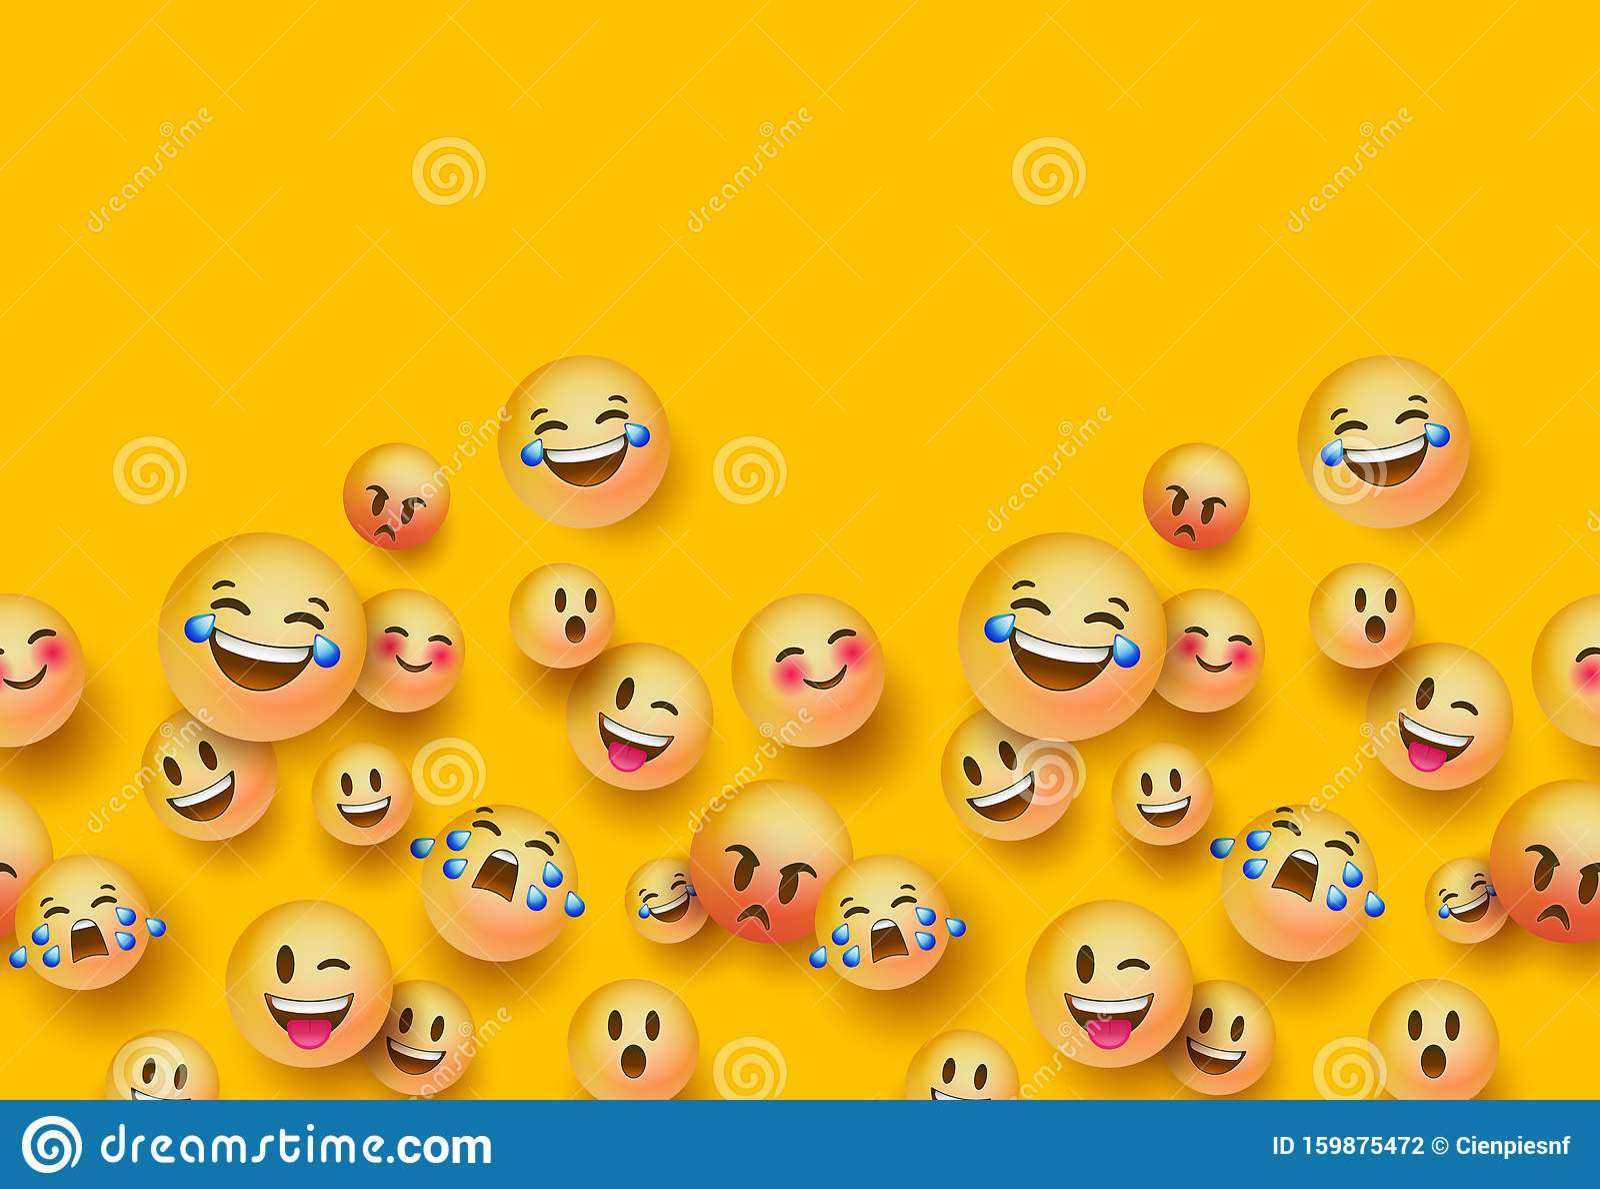 d fun emoji icon seamless pattern background fun d yellow emoticon face seamless pattern background copy space social chat 159875472